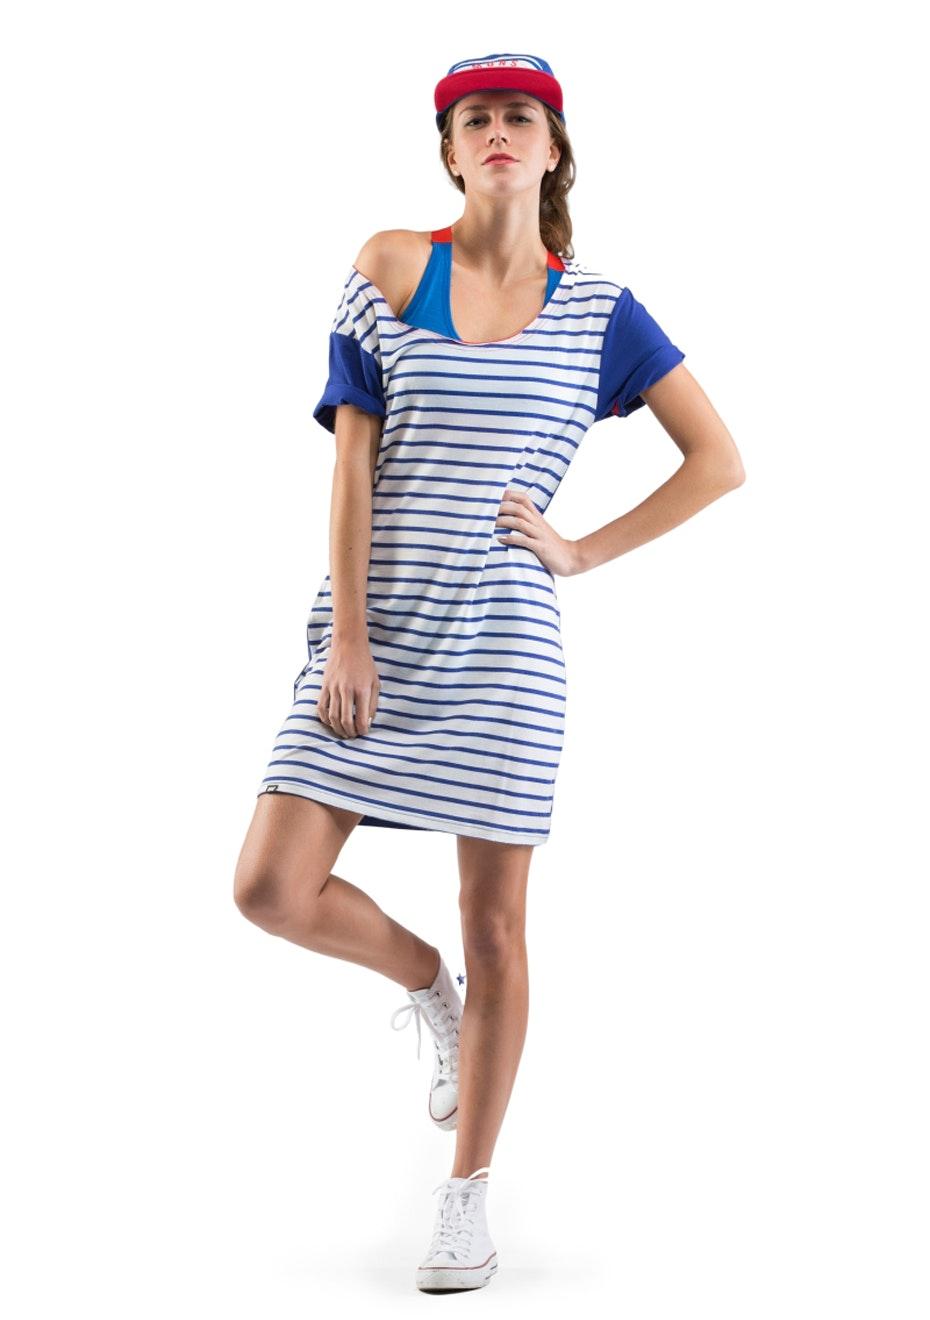 MONS ROYALE - Womens - Sunset Dress - Stripes / Regatta